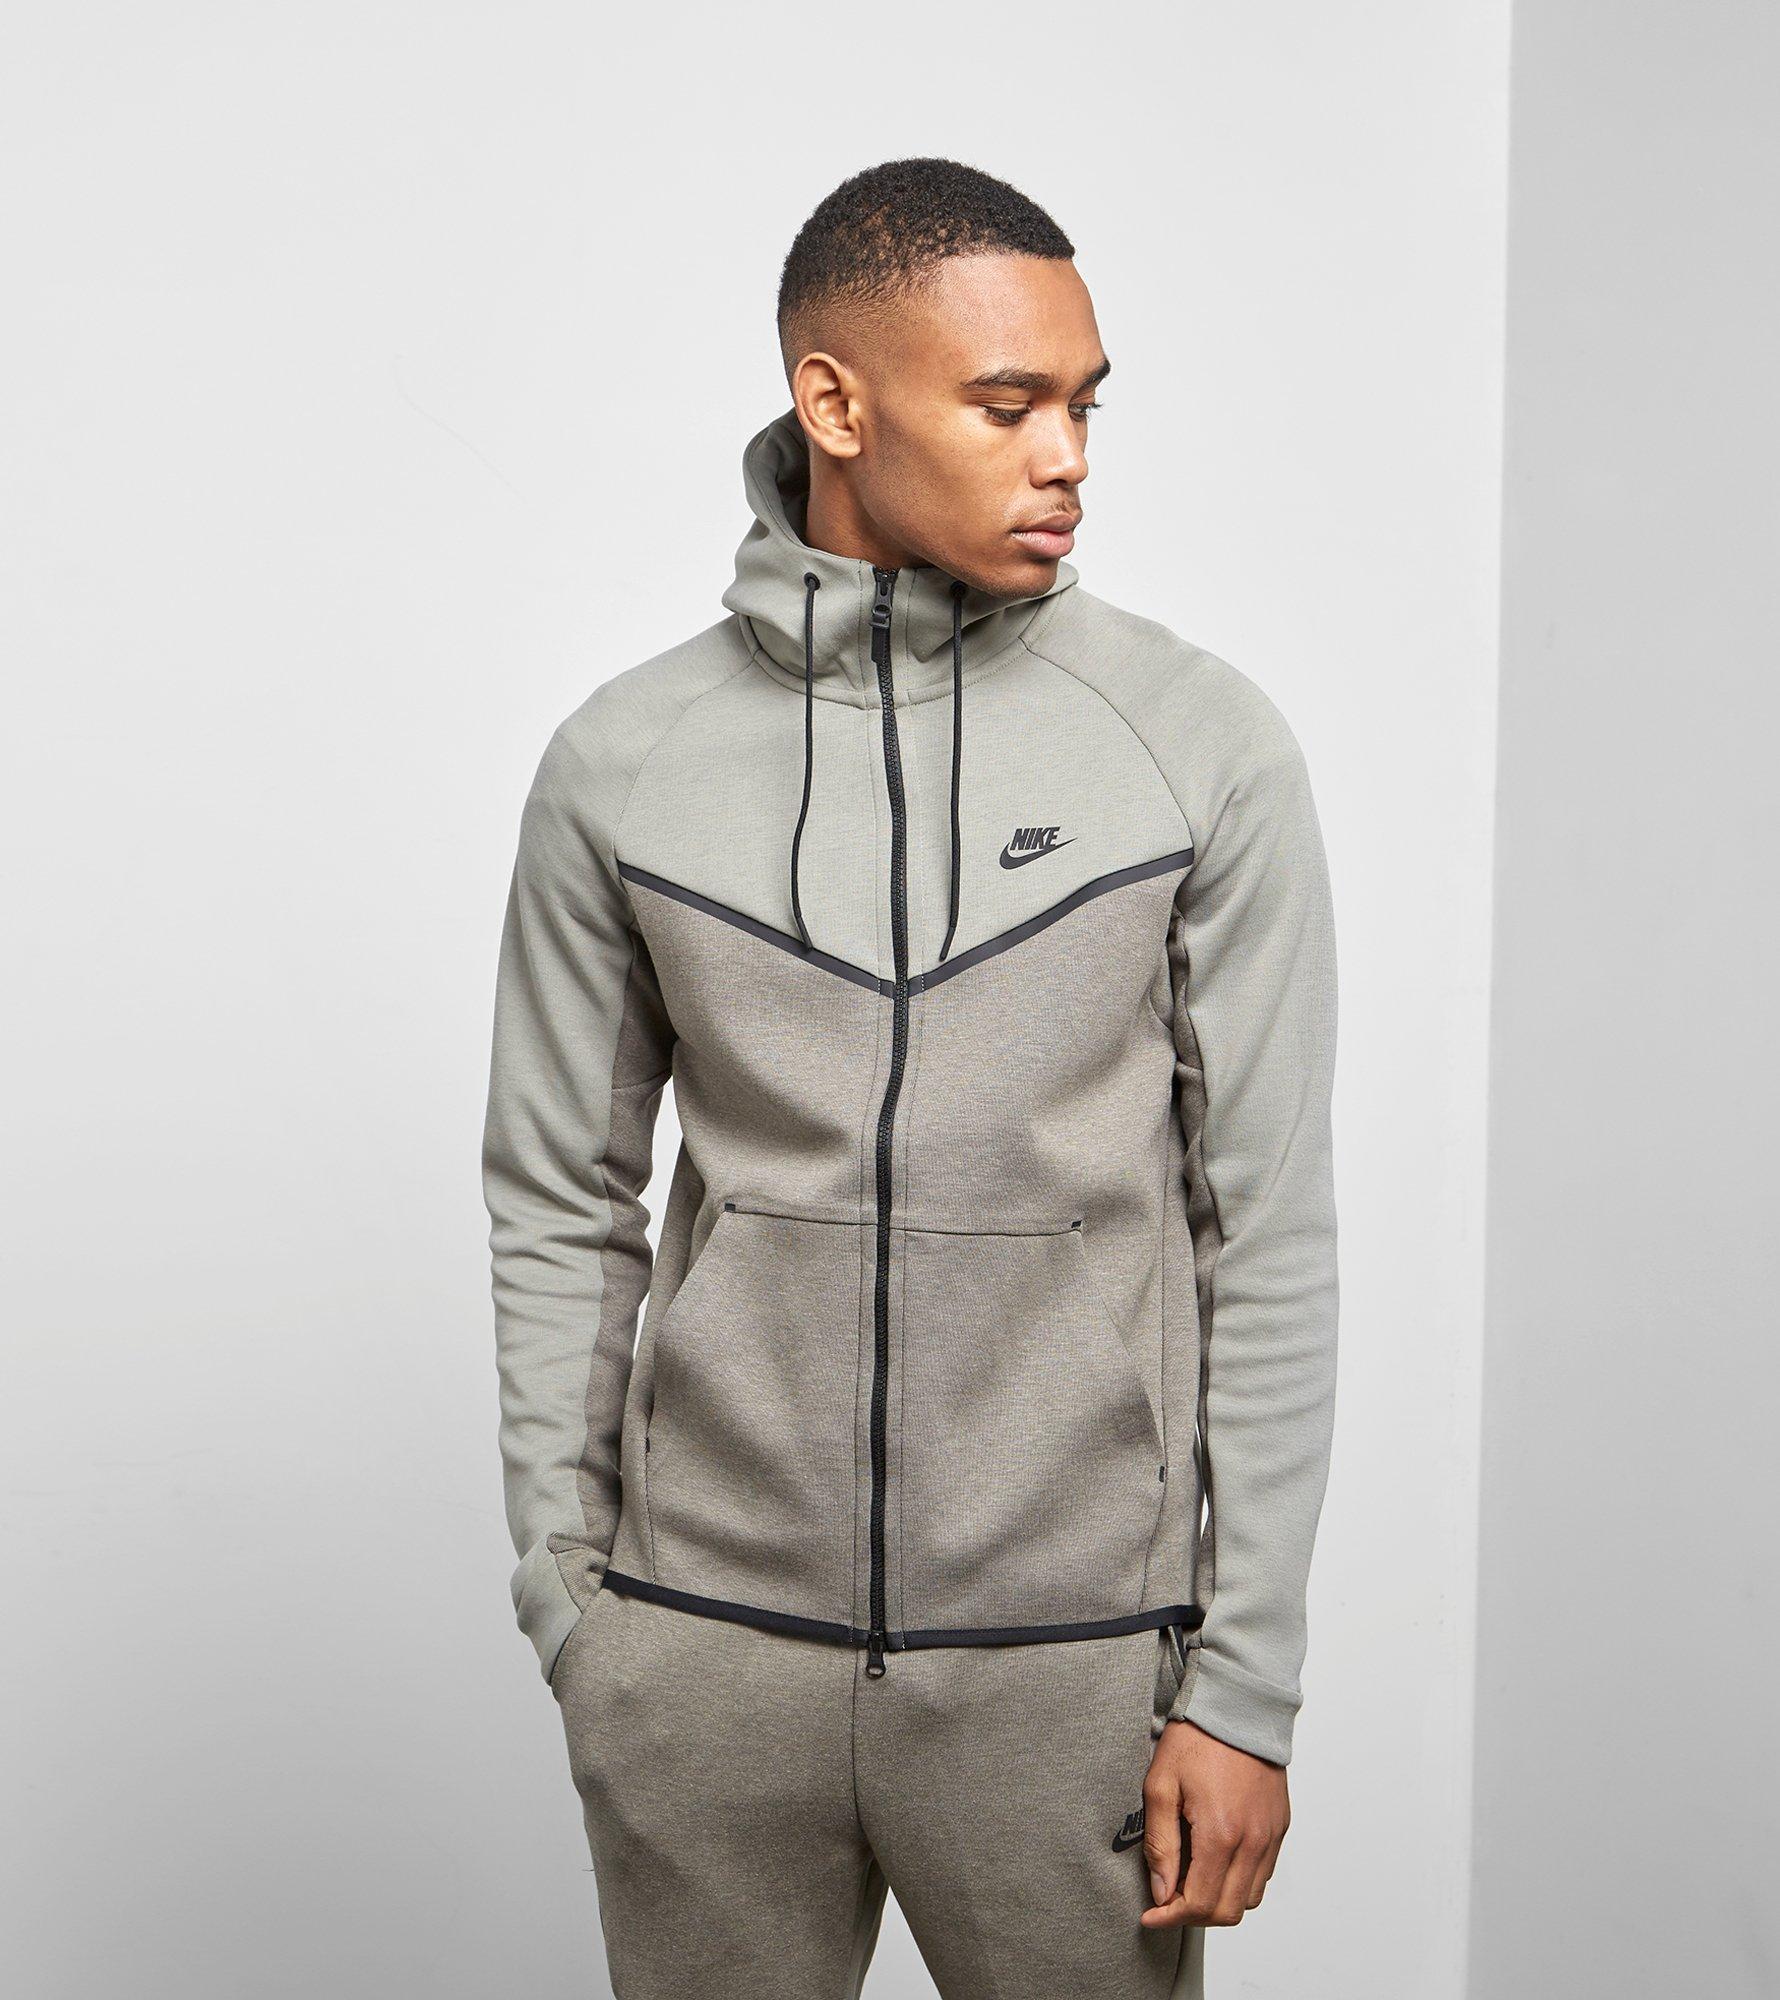 Lyst - Nike Tech Fleece Windrunner in Gray for Men 11faa3803166